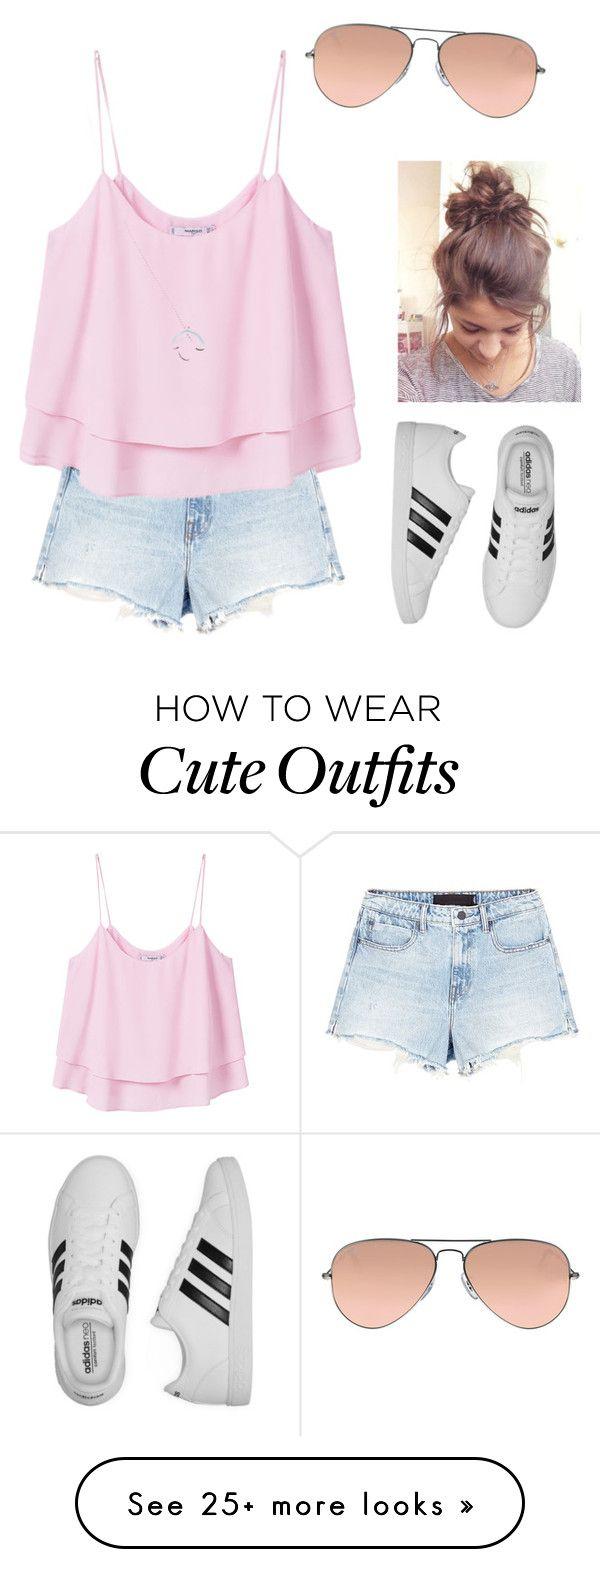 """Cute casual outfit "" by summeraraujo on Polyvore featuring MANGO, adidas, Alexander Wang, Wolf & Moon and Ray-Ban"